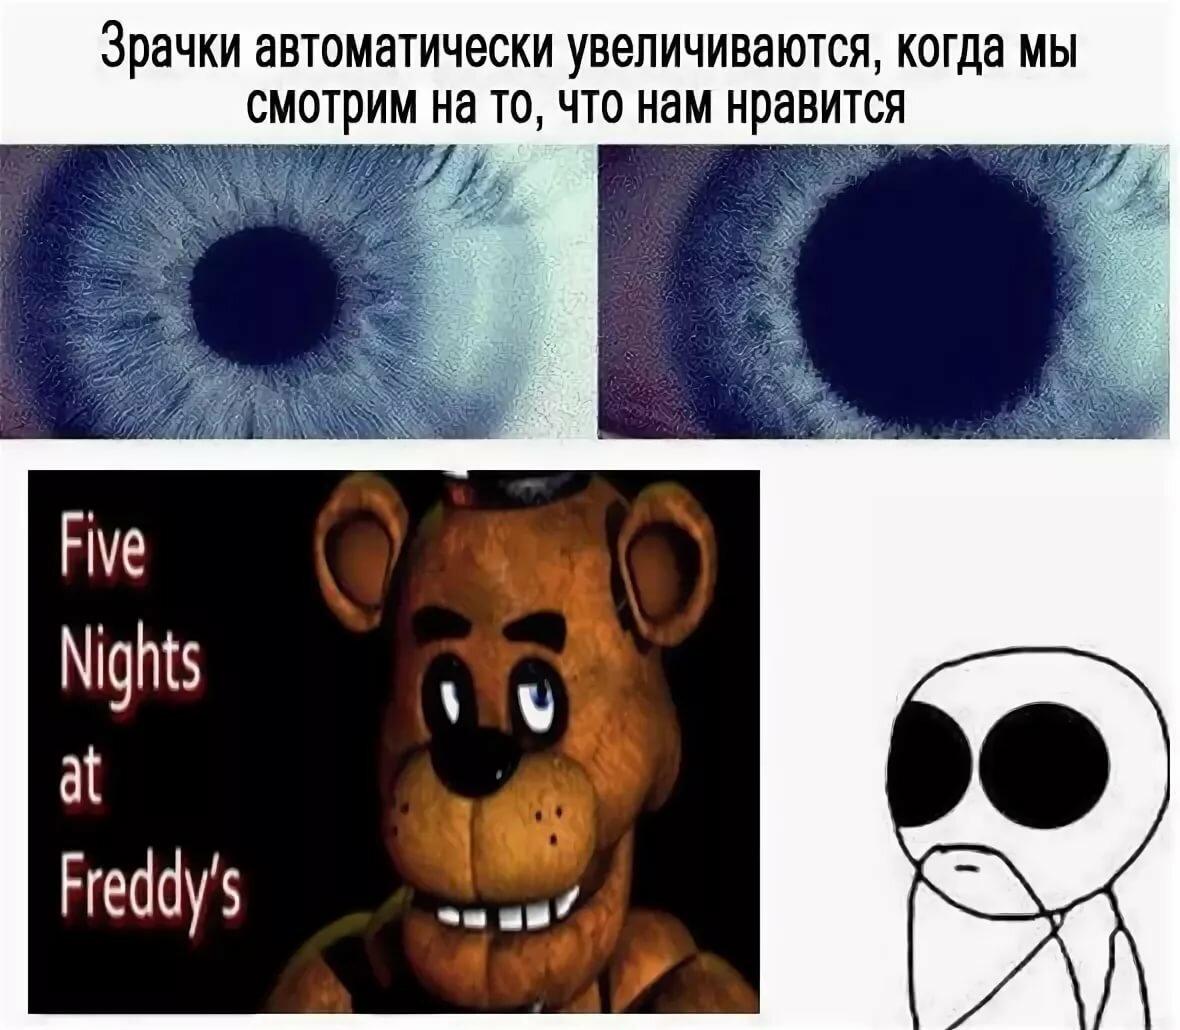 Фнаф приколы картинки на русском, гиф